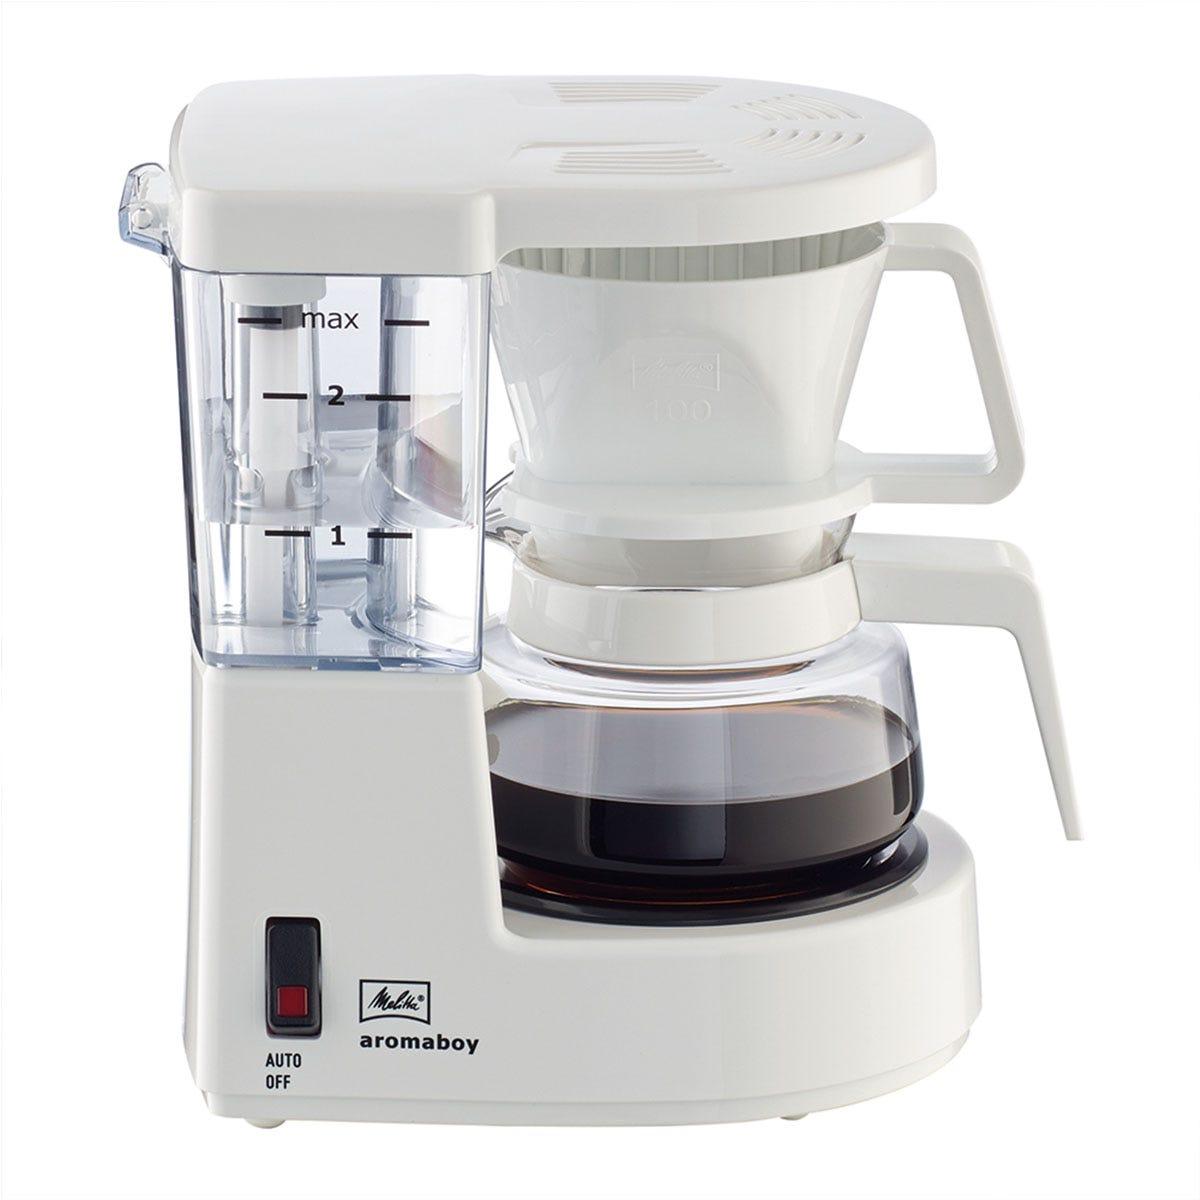 Melitta 6707248 Aromaboy 500W Filter Coffee Machine - White